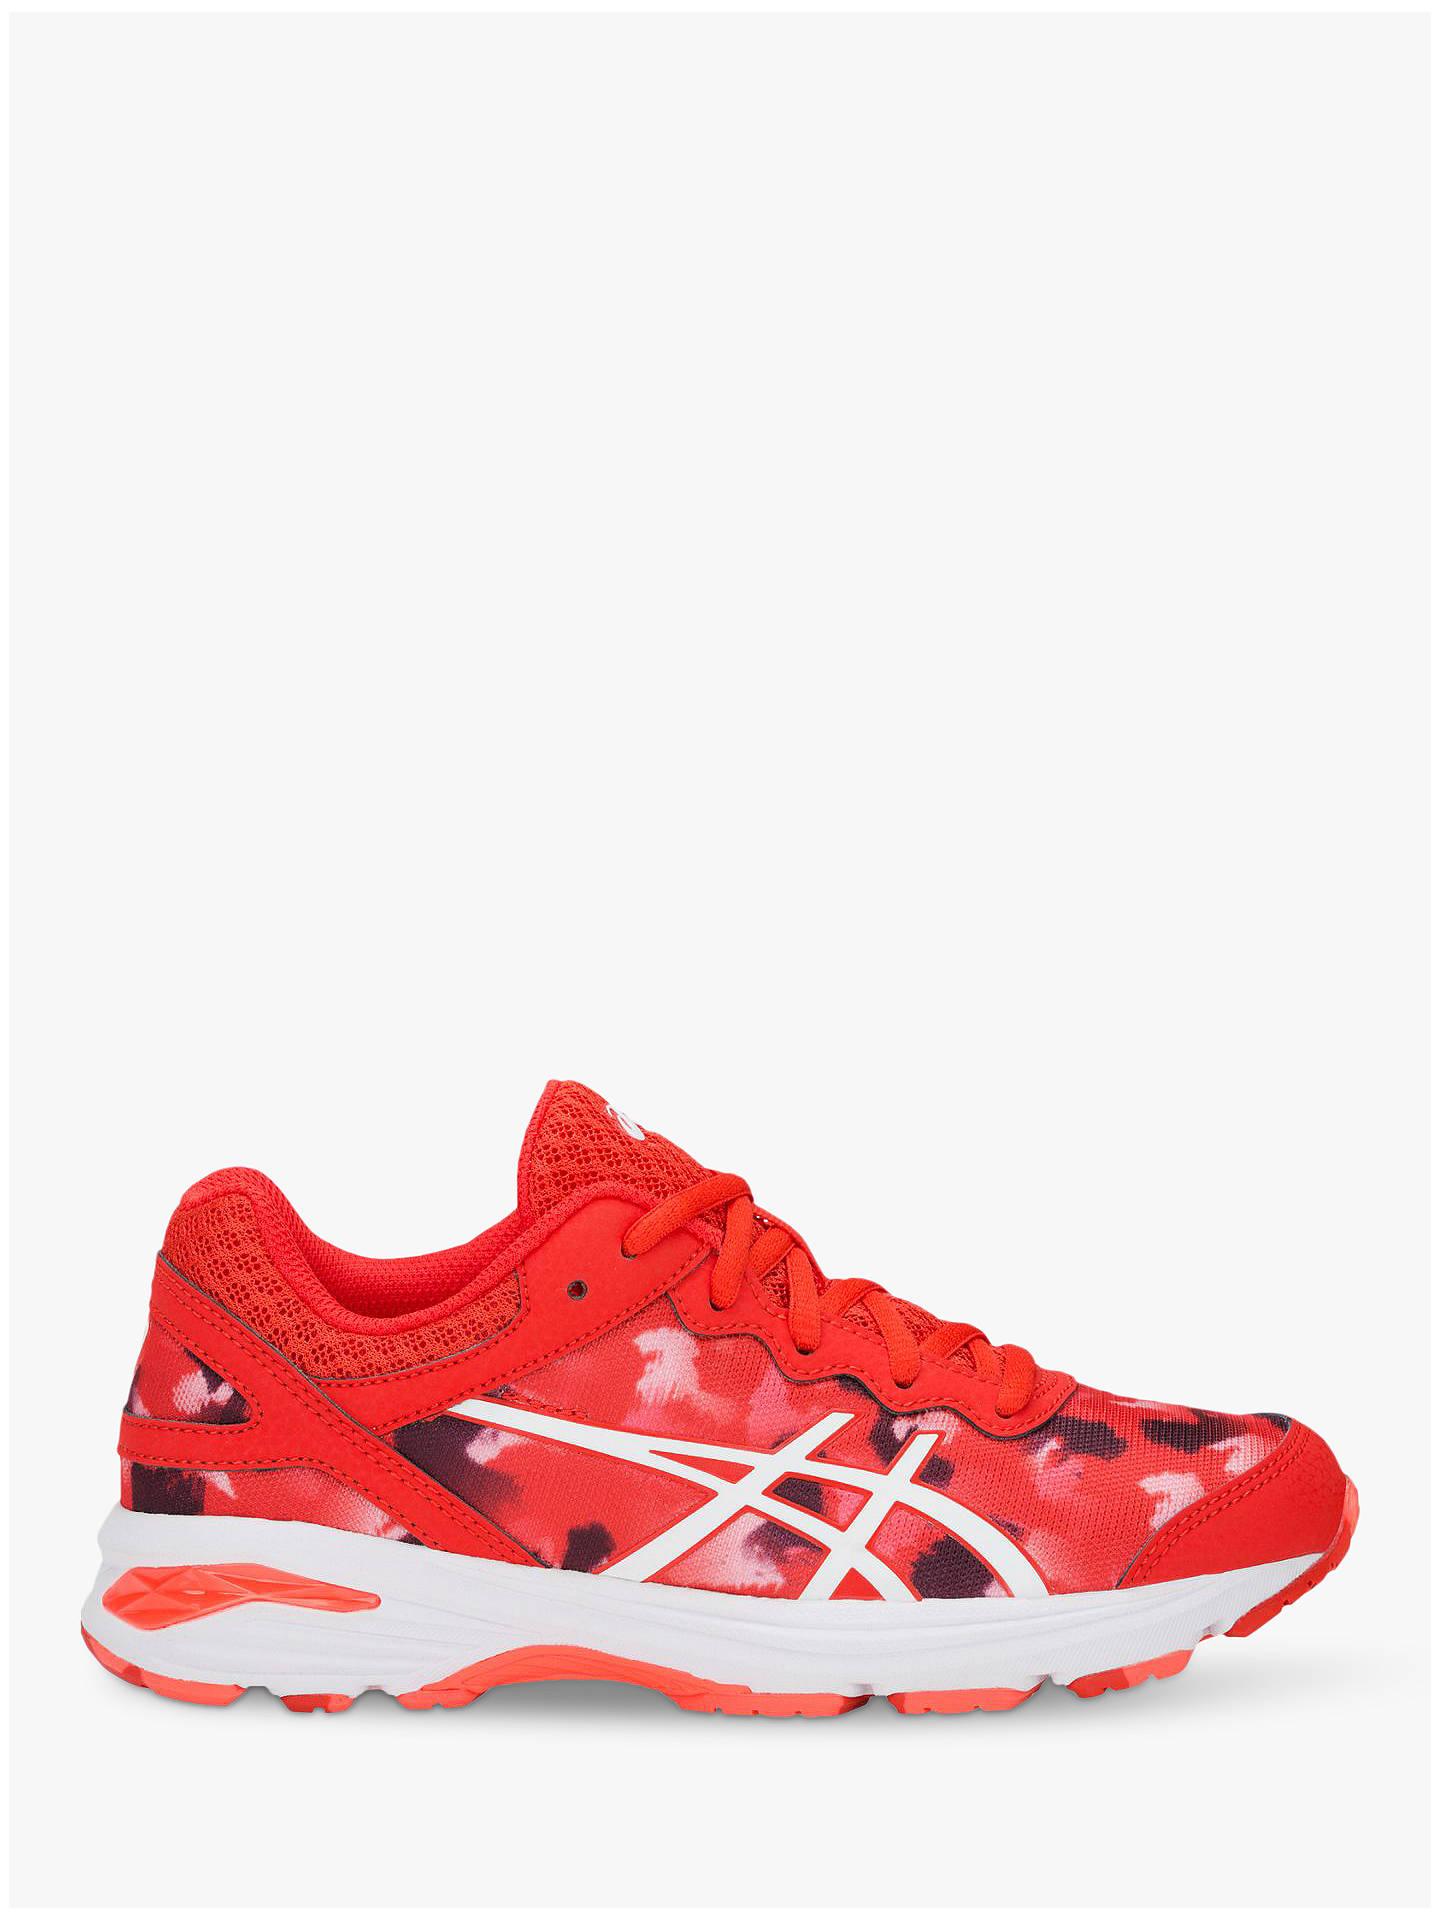 ASICS Children's GEL Netburner Professional GS Netball Shoes, Fiery RedWhite